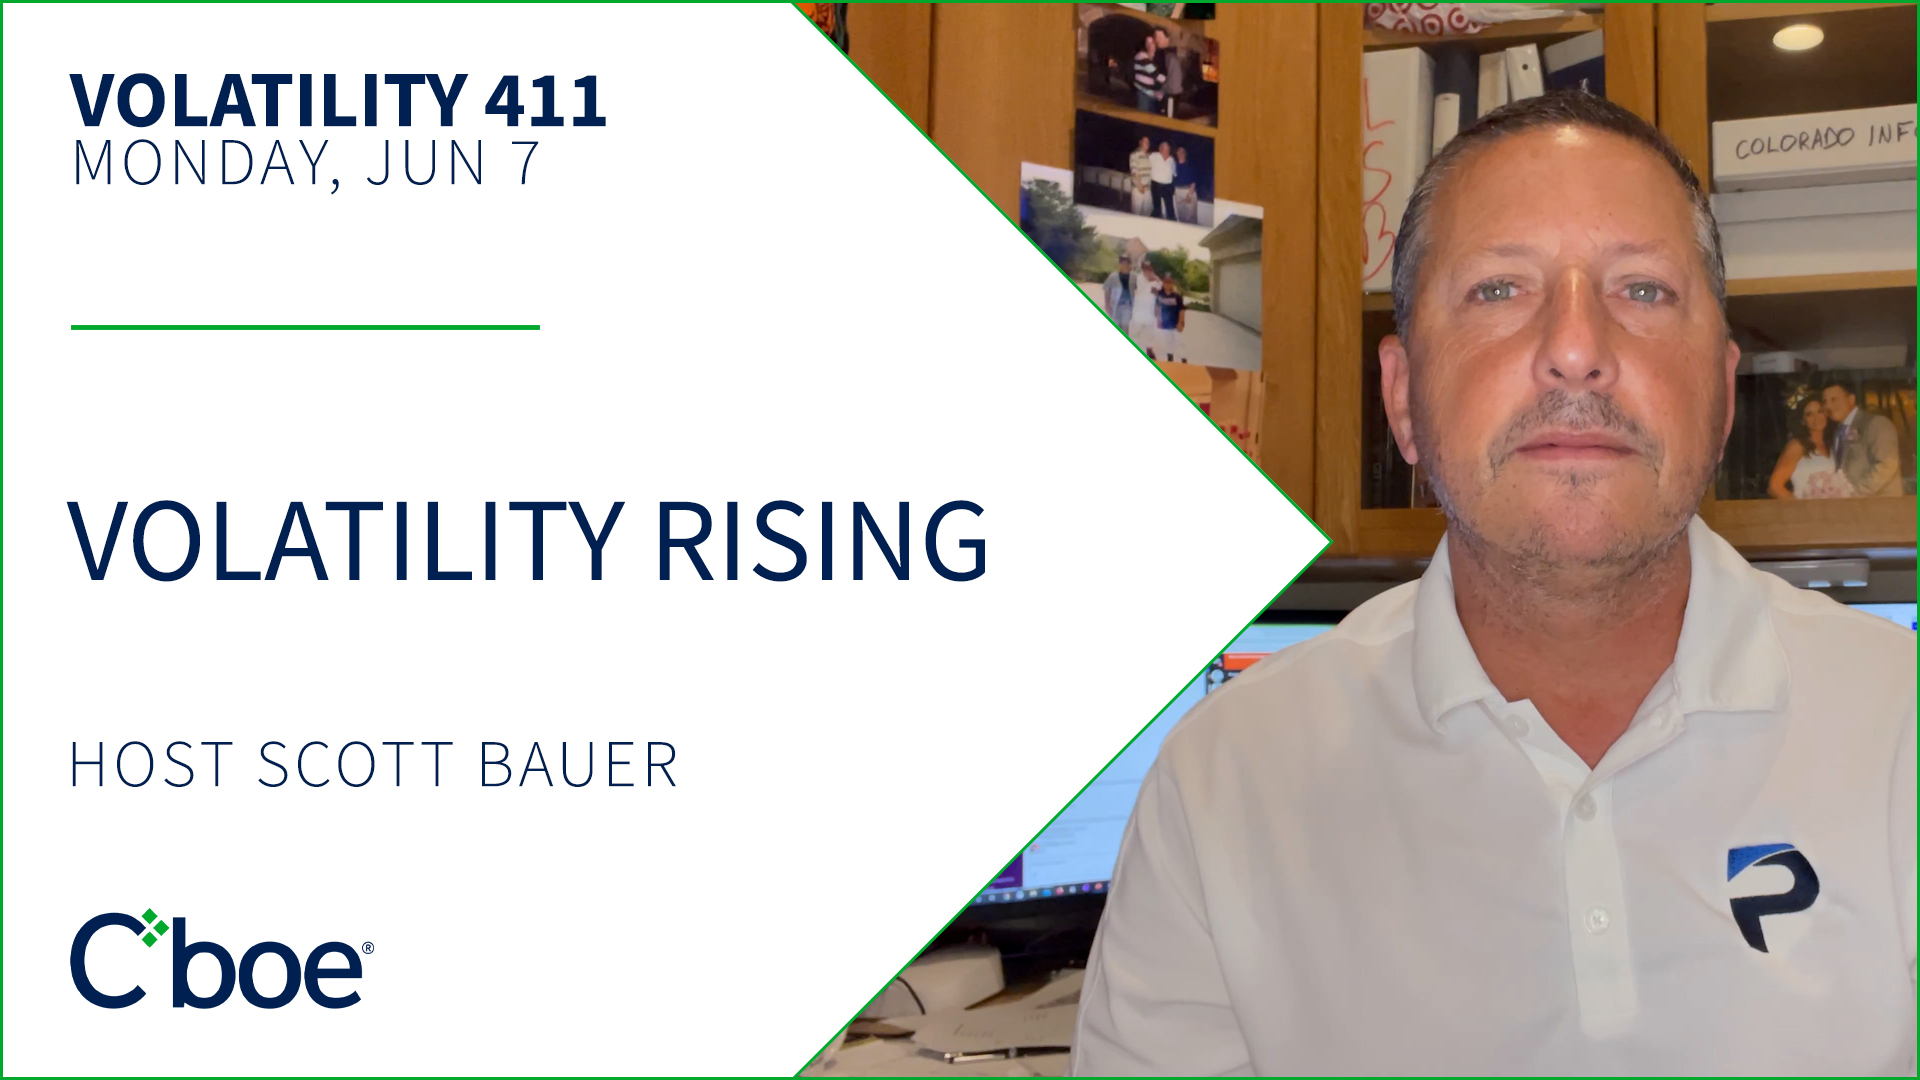 Volatility Rising Thumbnail